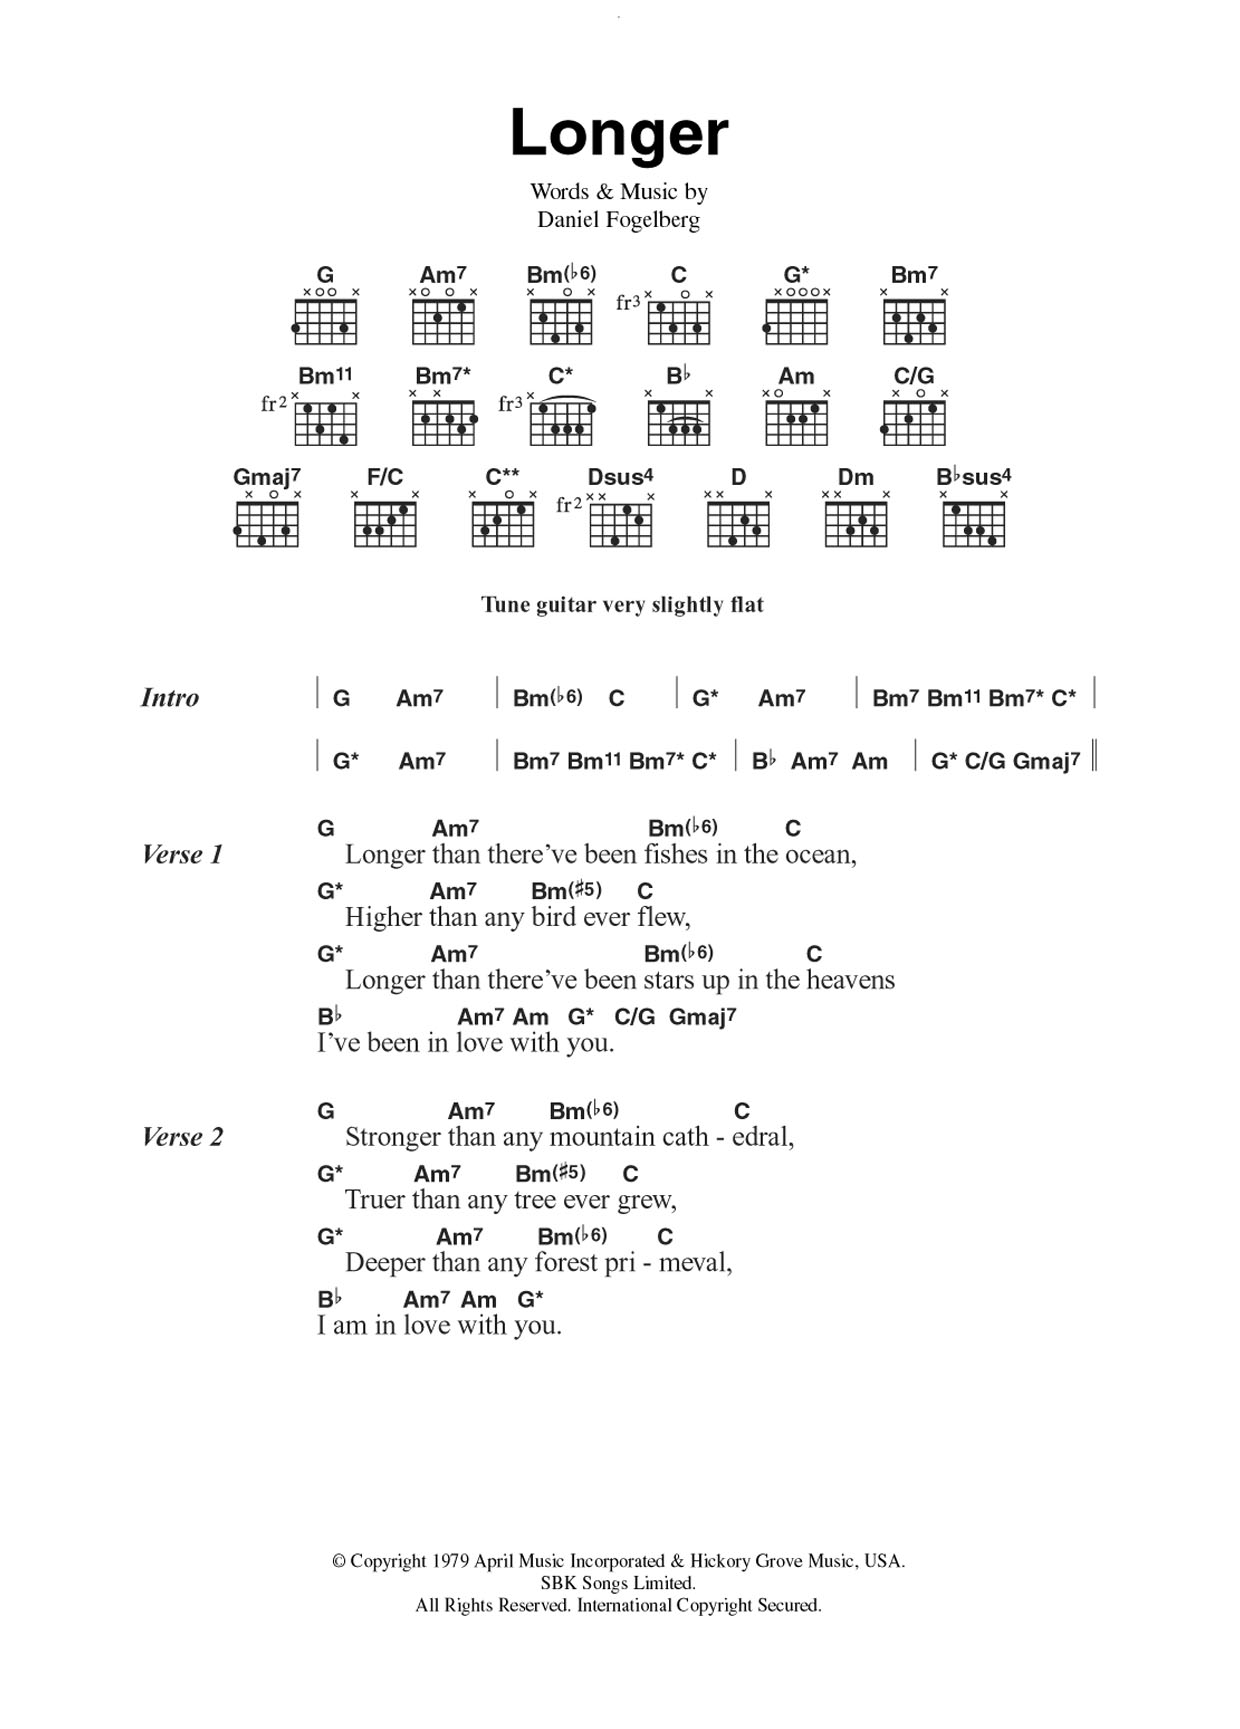 Longer Dan Fogelberg Lyrics Chords